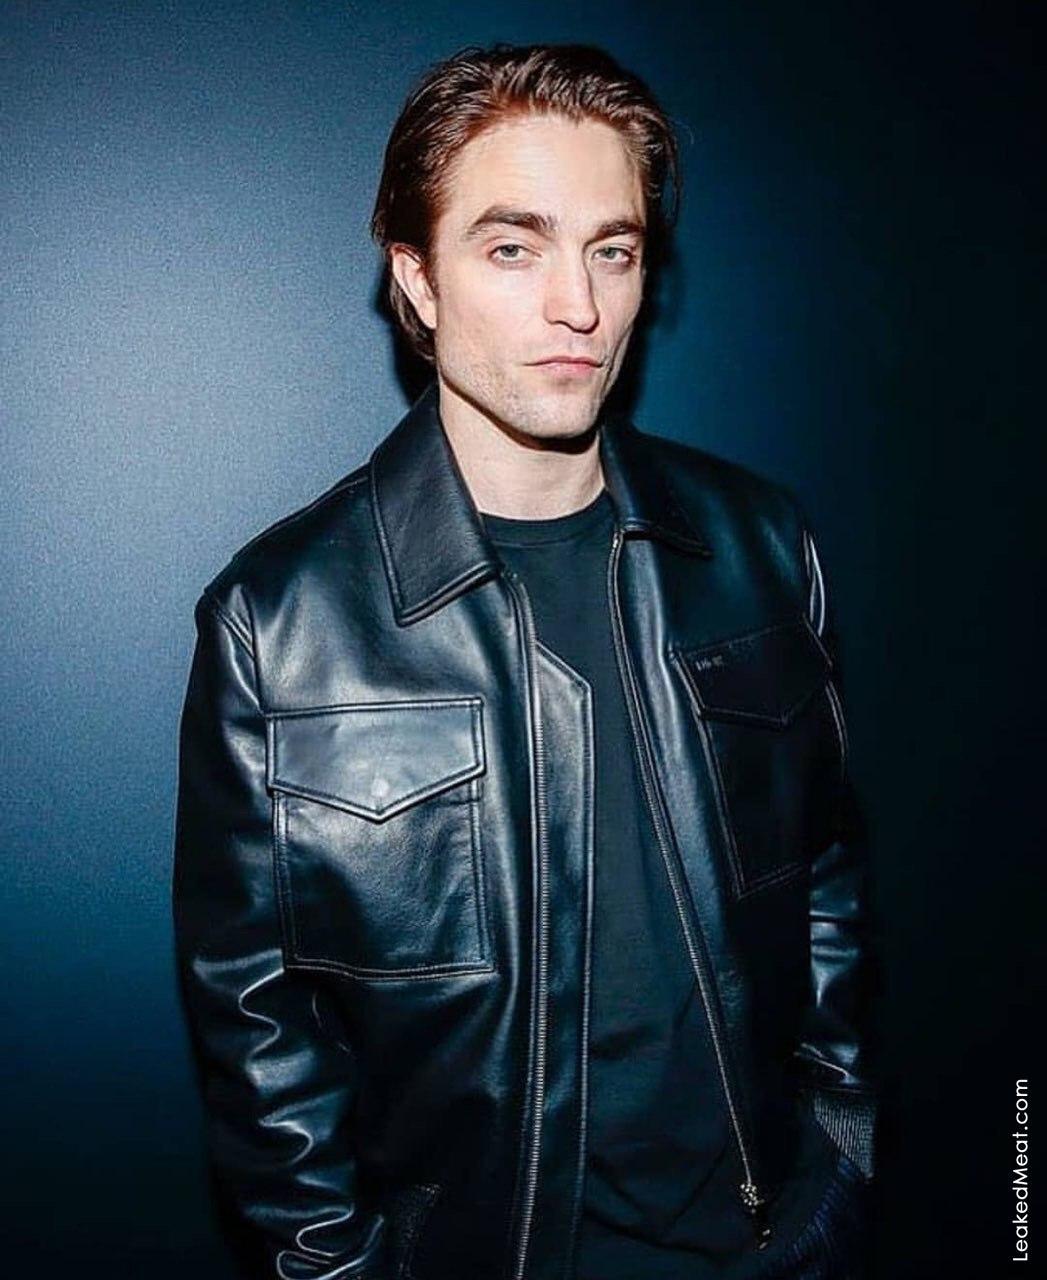 Robert Pattinson | LeakedMeat 8